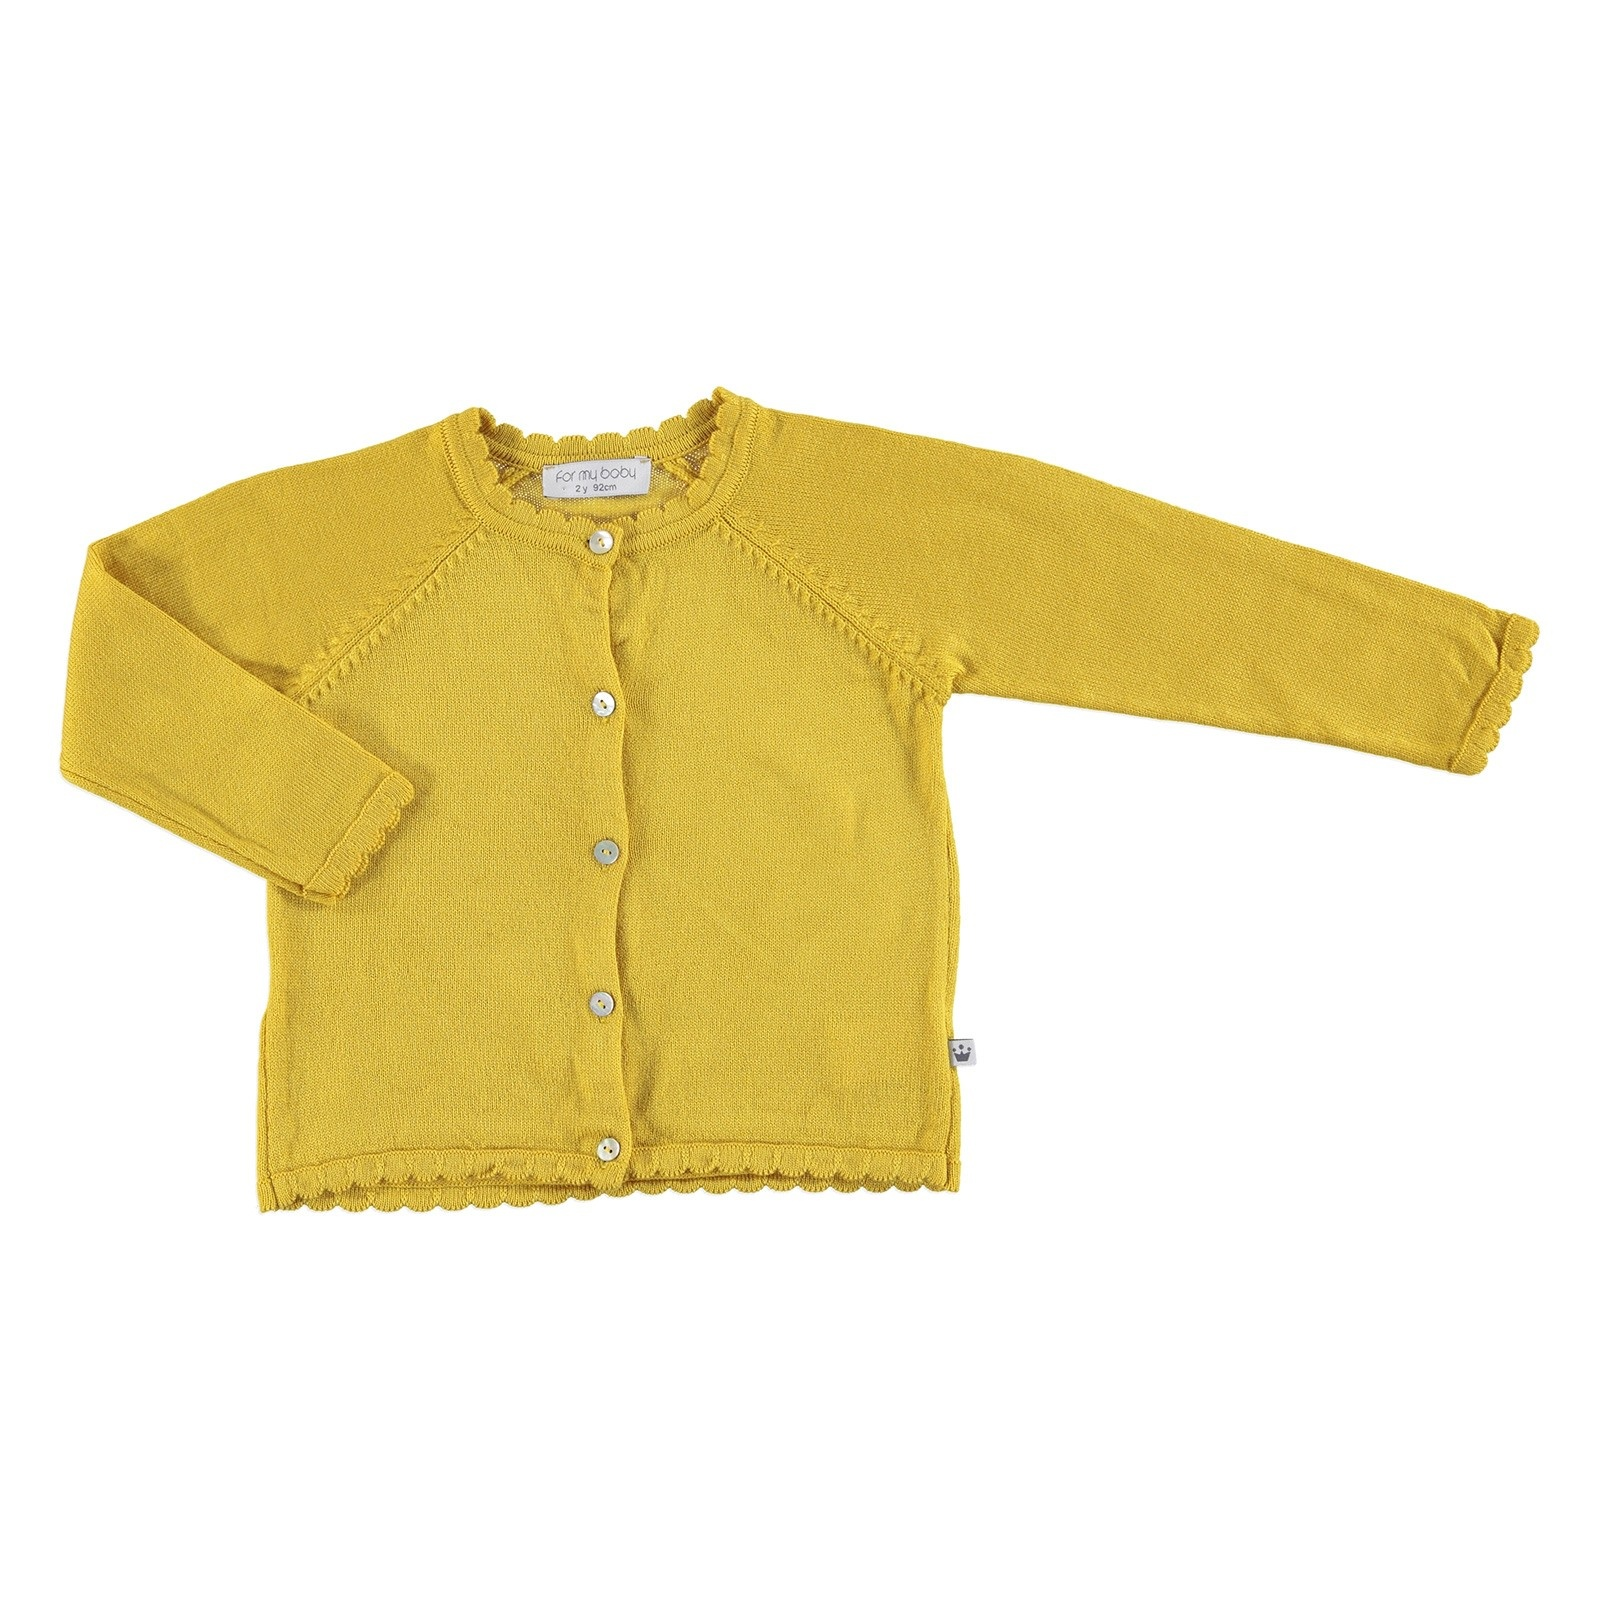 Ebebek For My Baby Girl Knit Cardigan